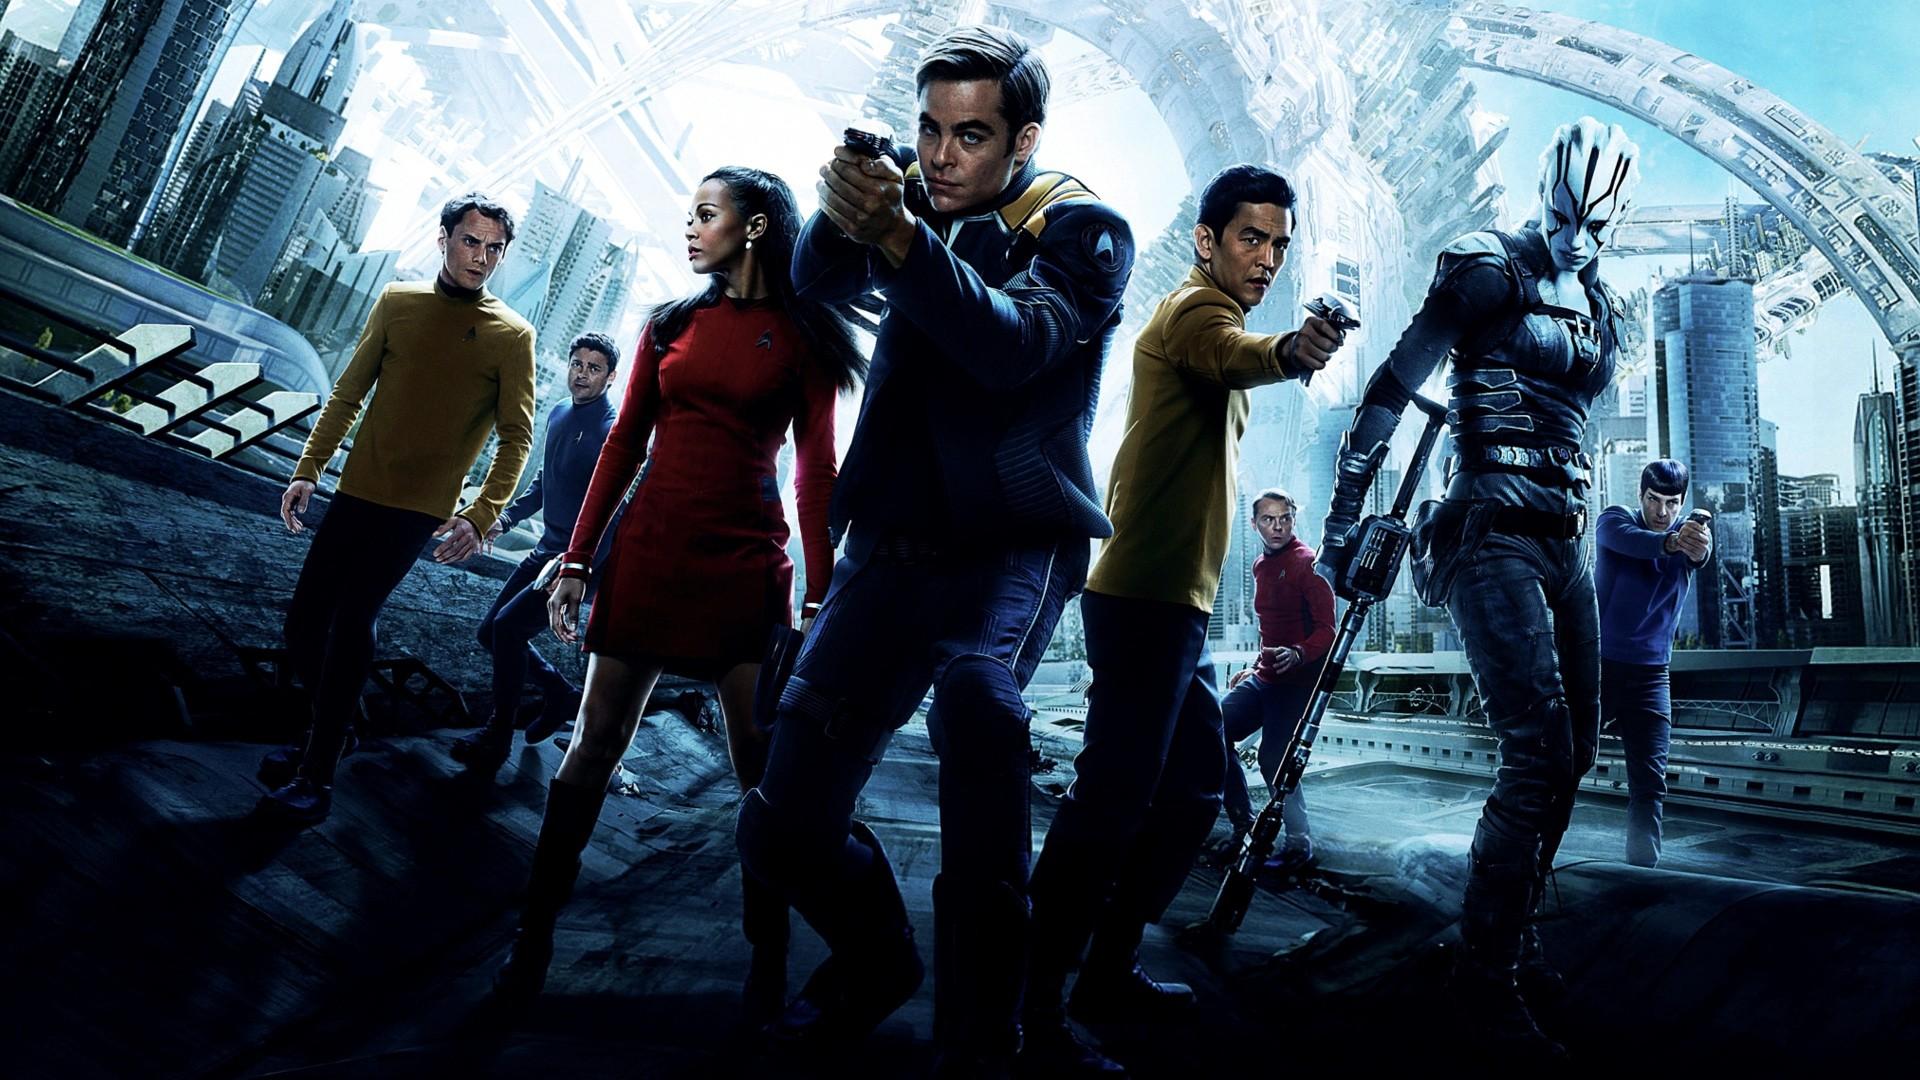 Star Trek Full HD Wallpaper